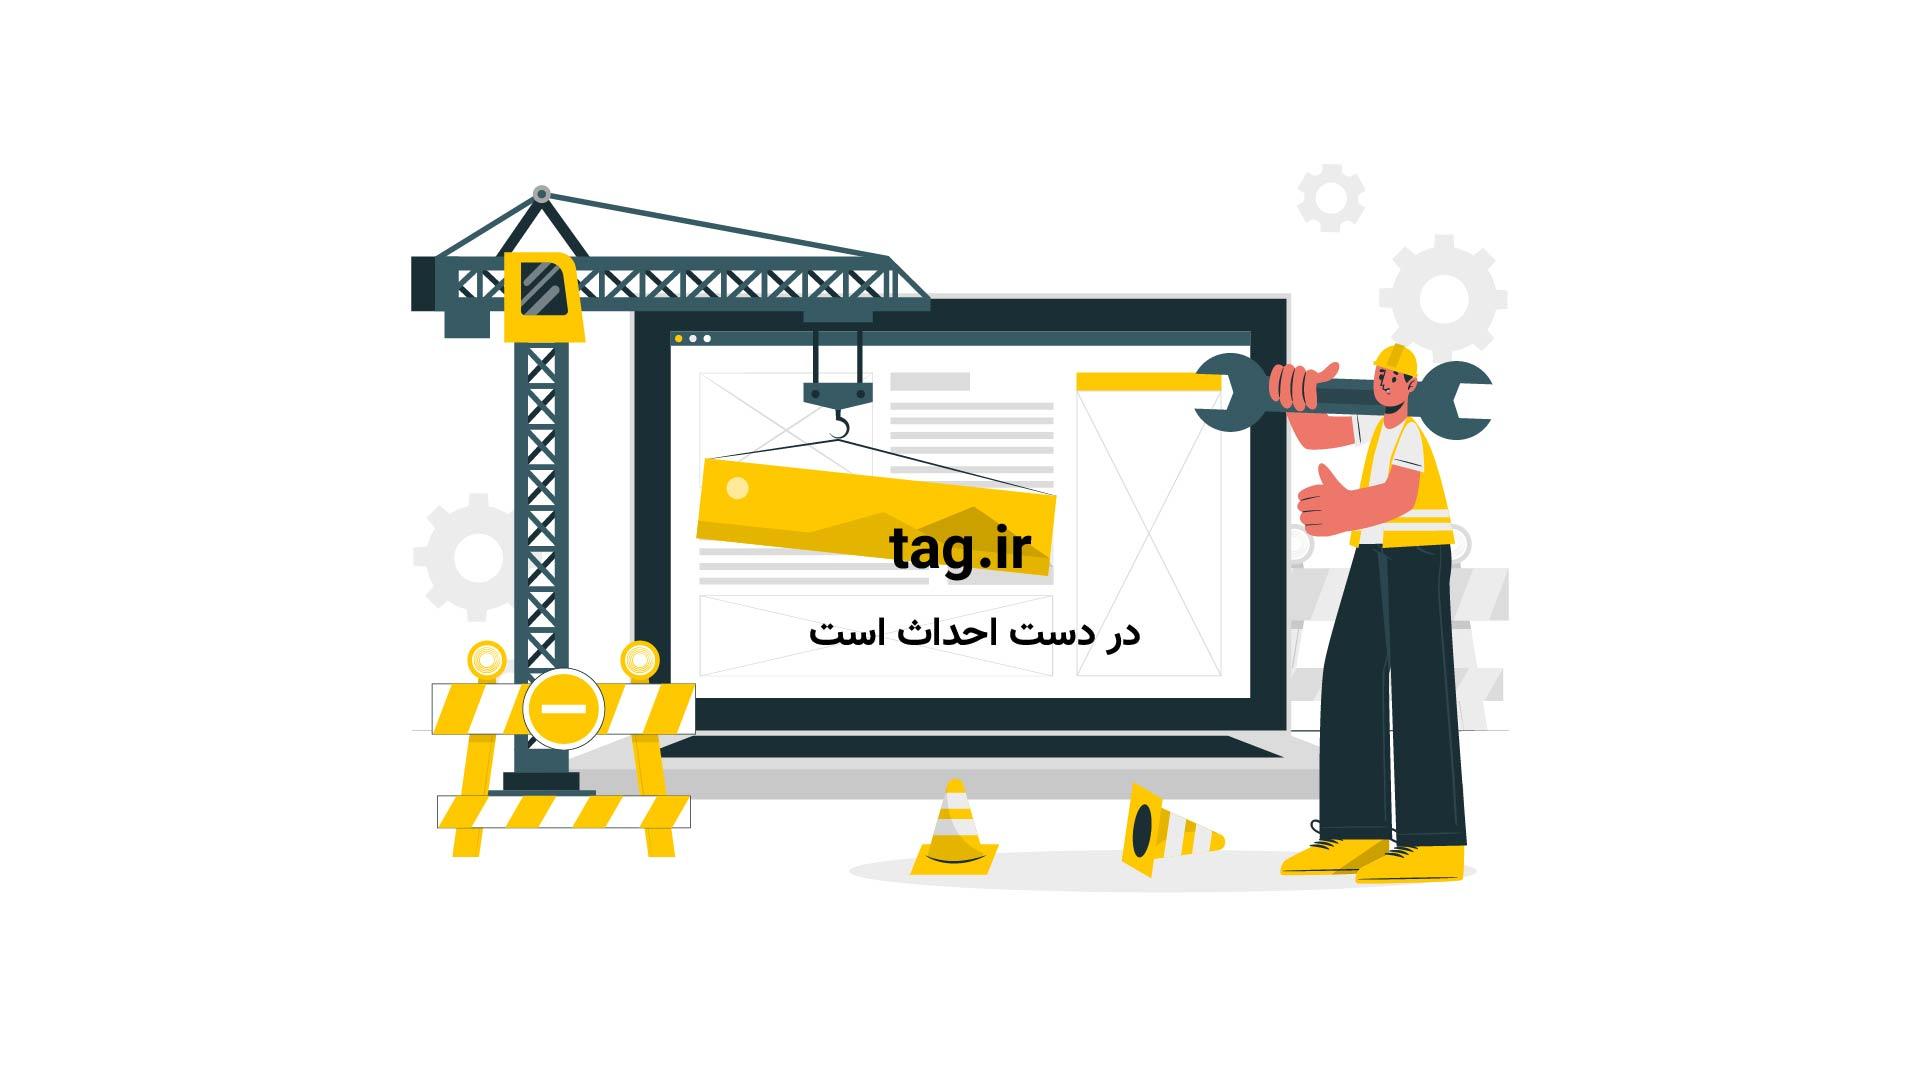 کوه سلطان | تگ